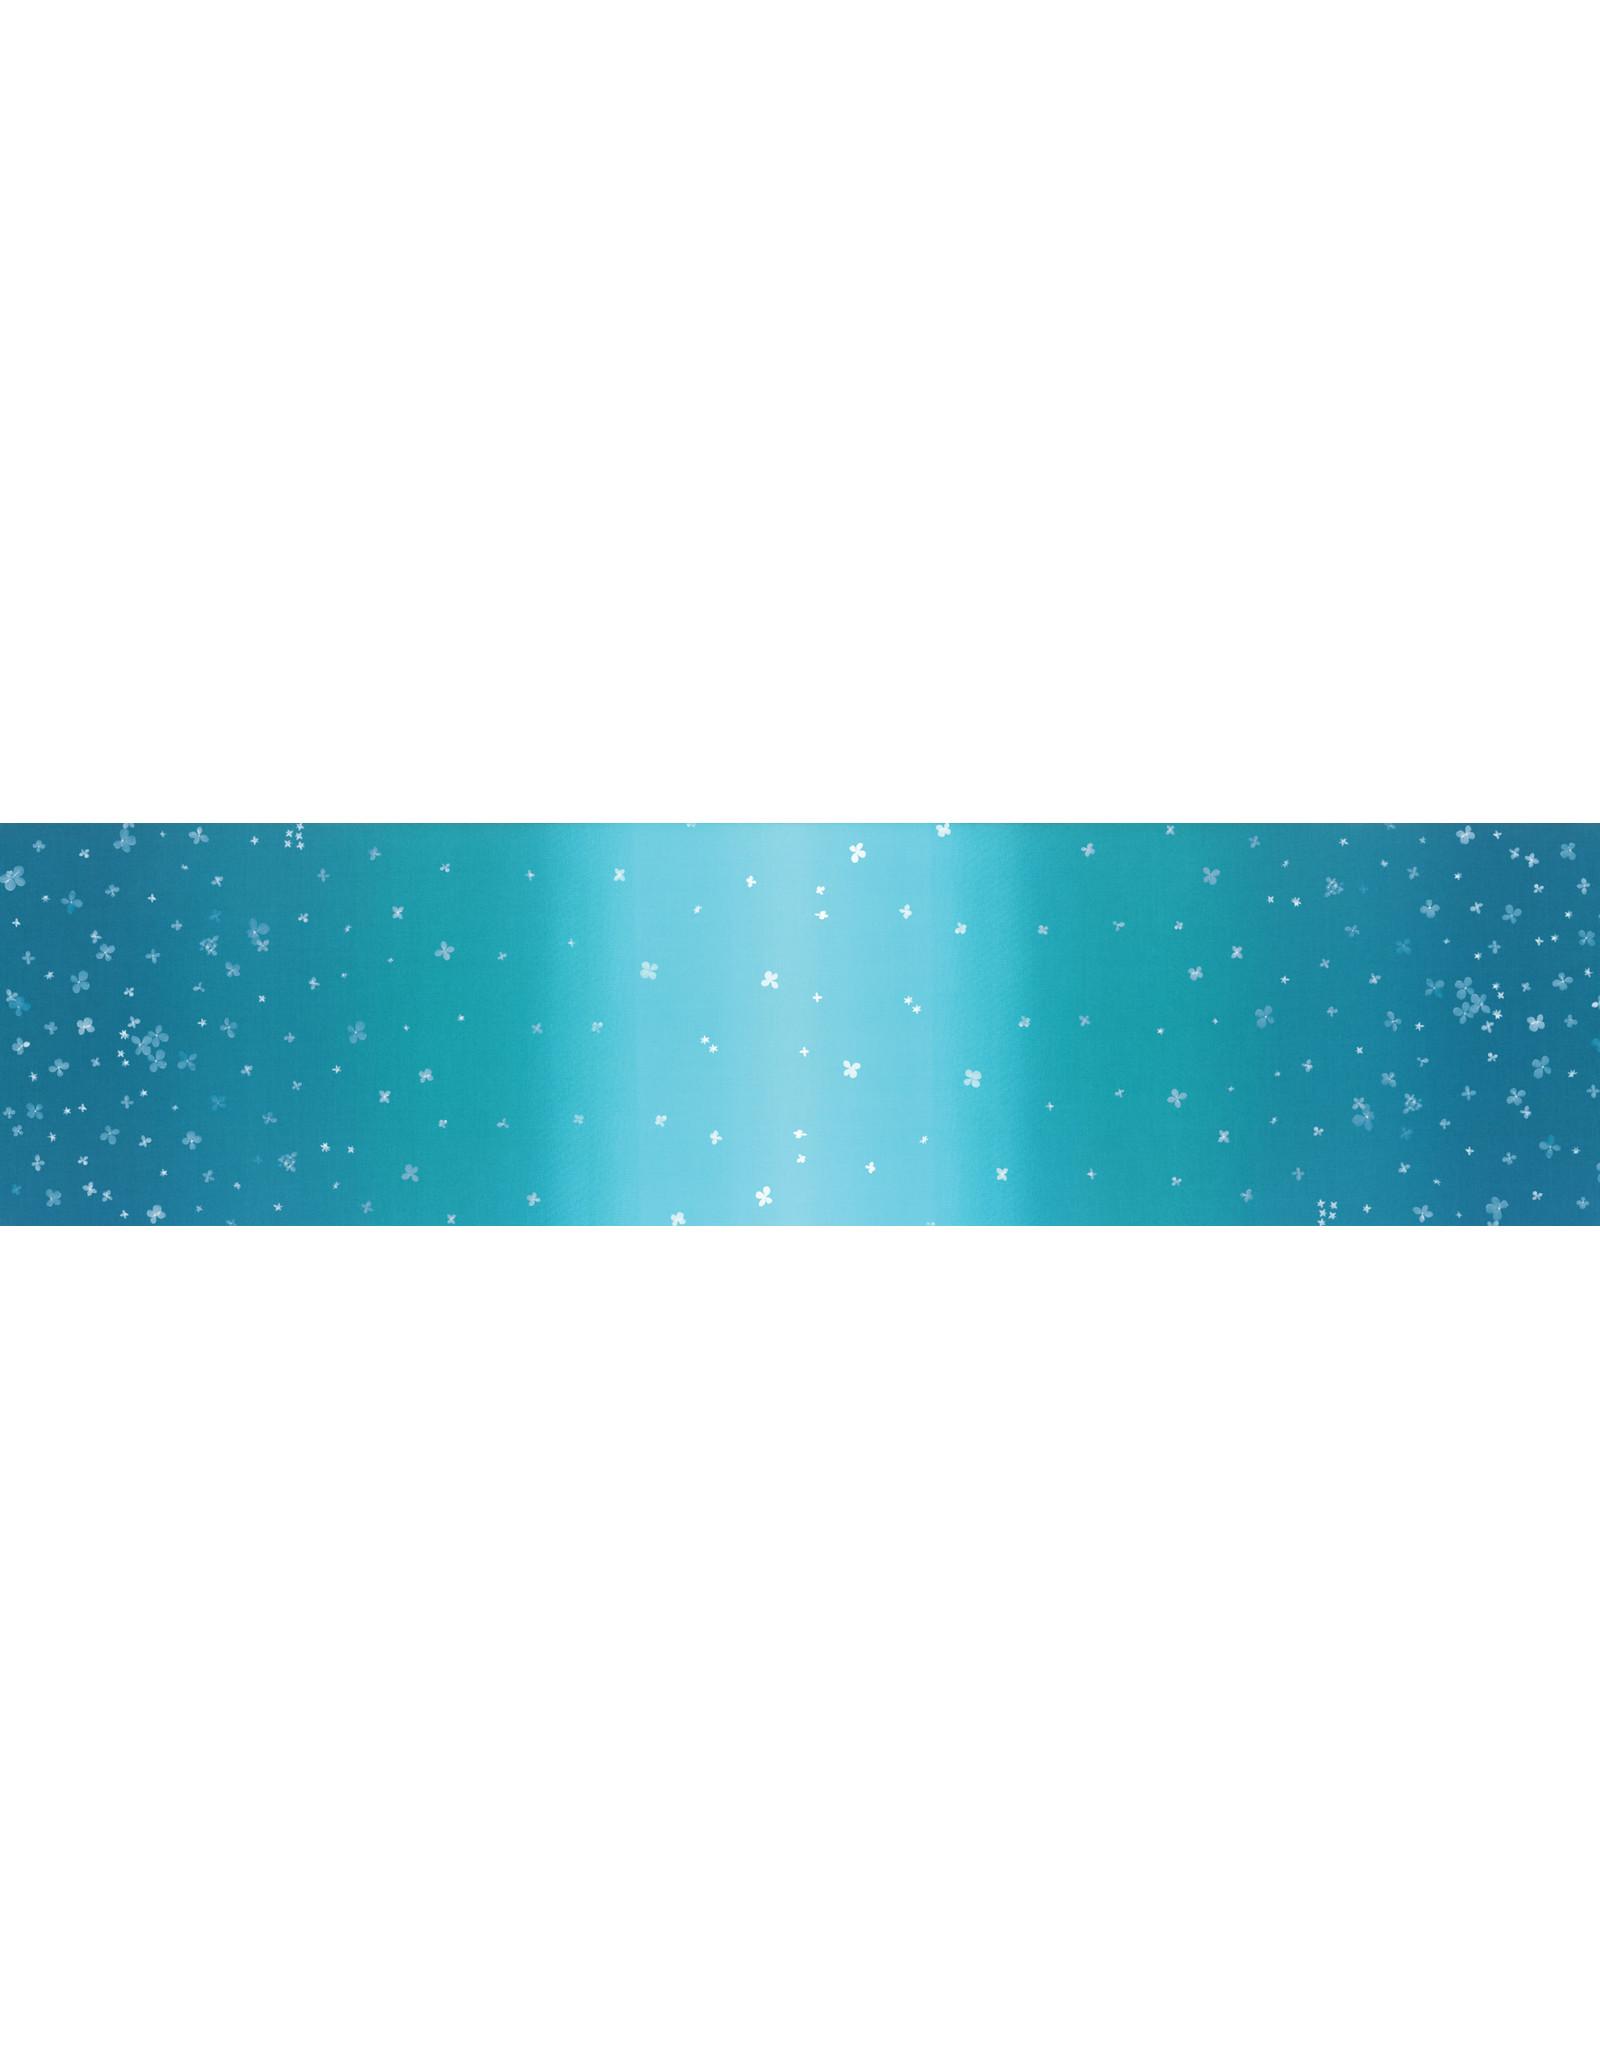 Moda Ombre Bloom - Turquoise